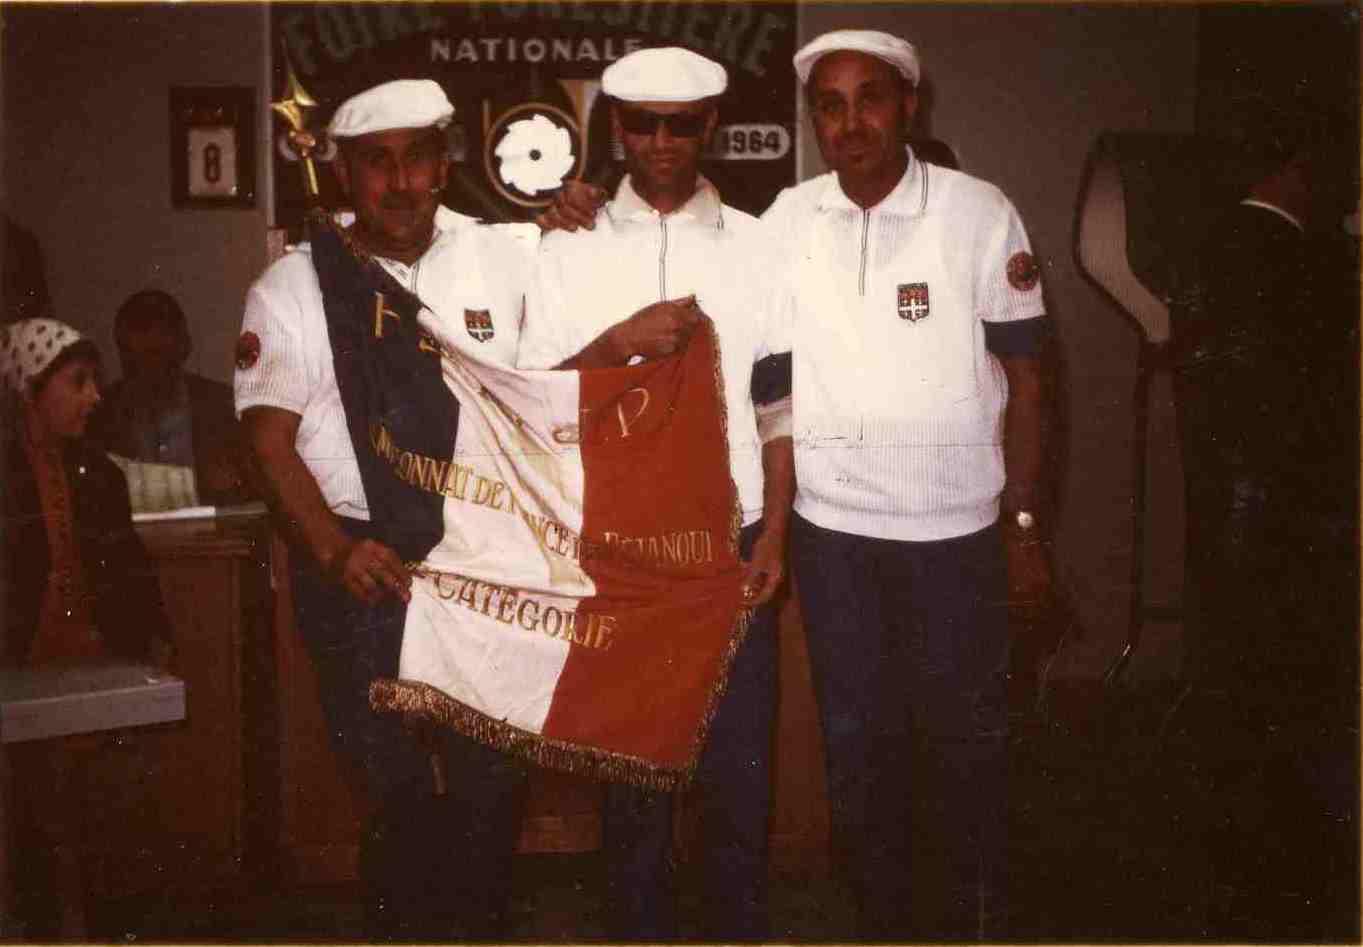 Les champions de France triplettes 1964 > Adolphe MACCAGNO - Alphonse PELLI - Maurice GAVINO